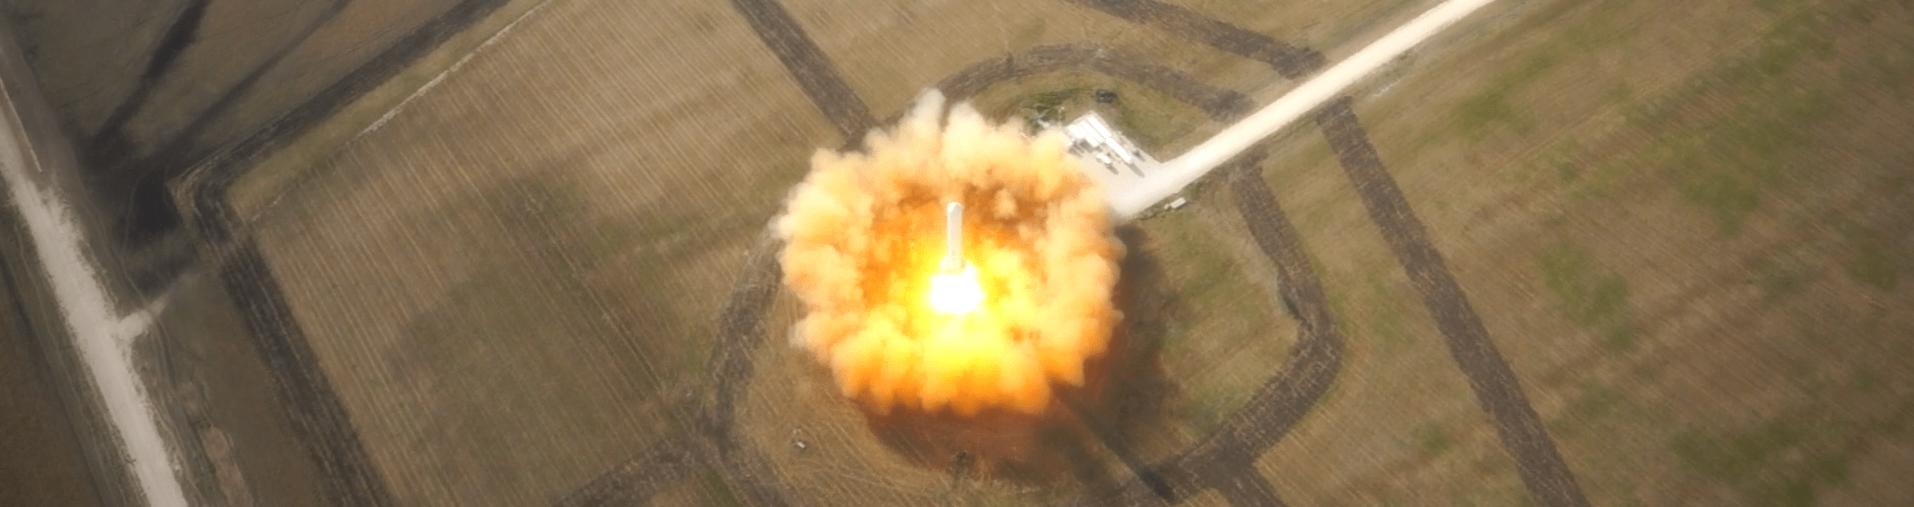 IGNITE Technology Take-off